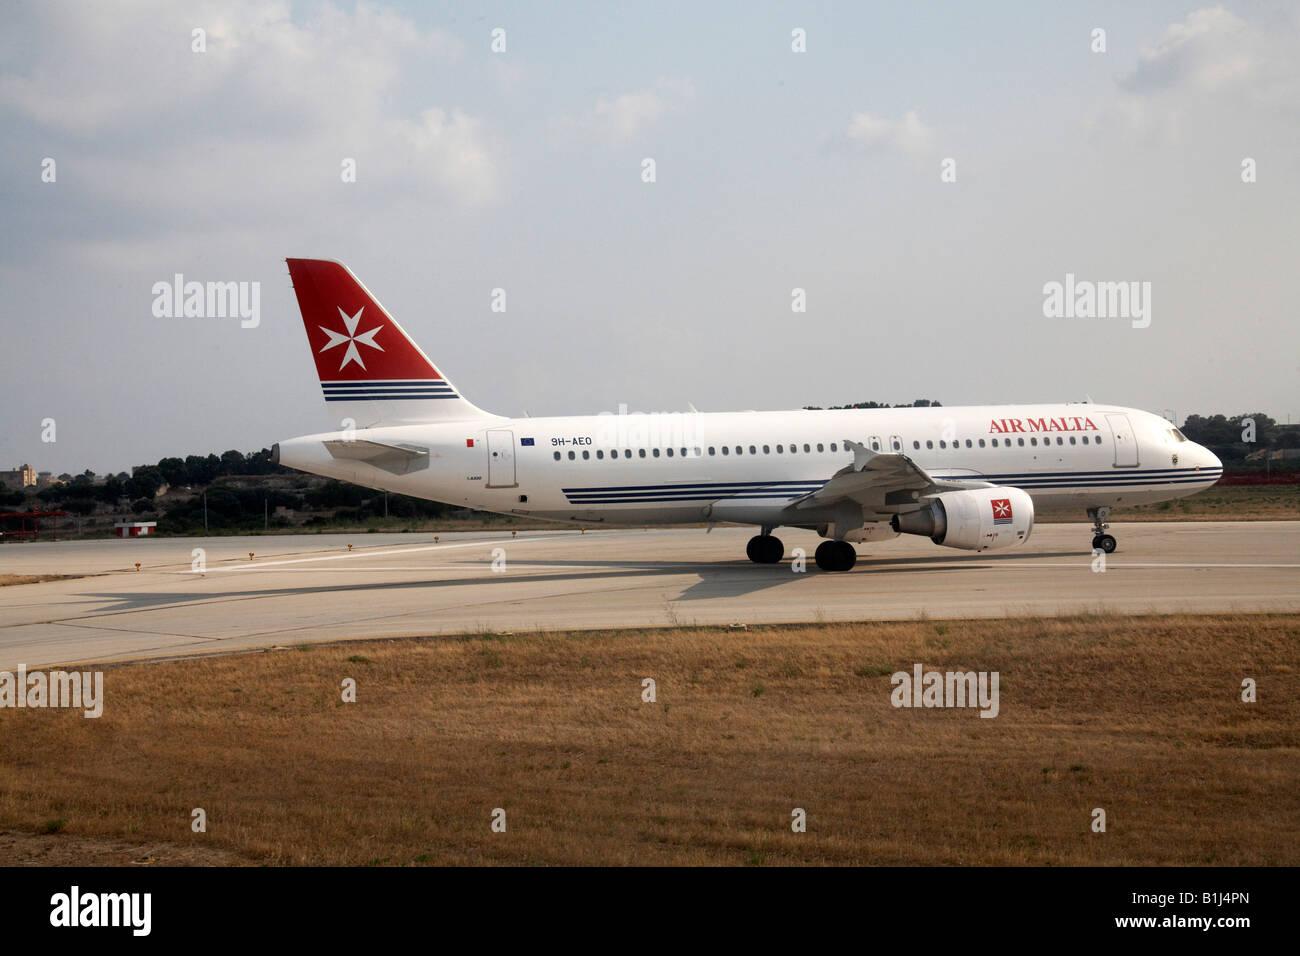 Air Malta Airbus A320 214 aircraft taxiing on taxiway at Malta International Airport - Stock Image